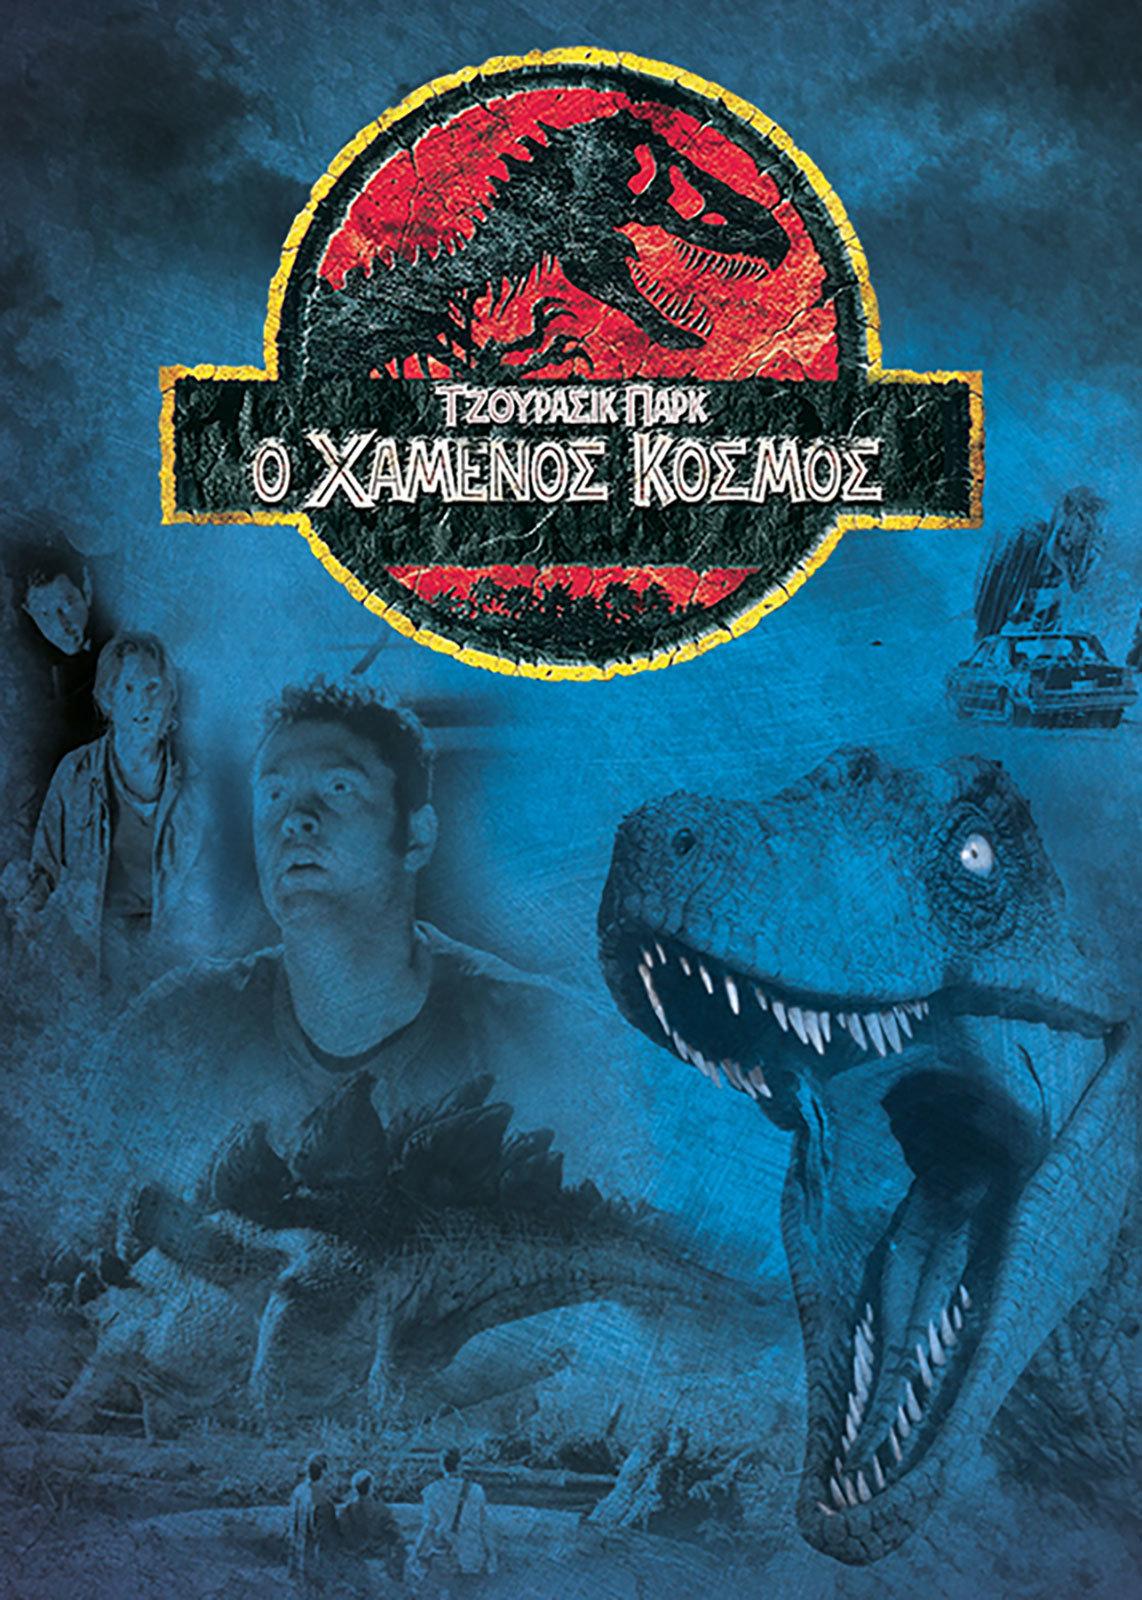 Jurassic Park The Lost World Greek title design for Netflix